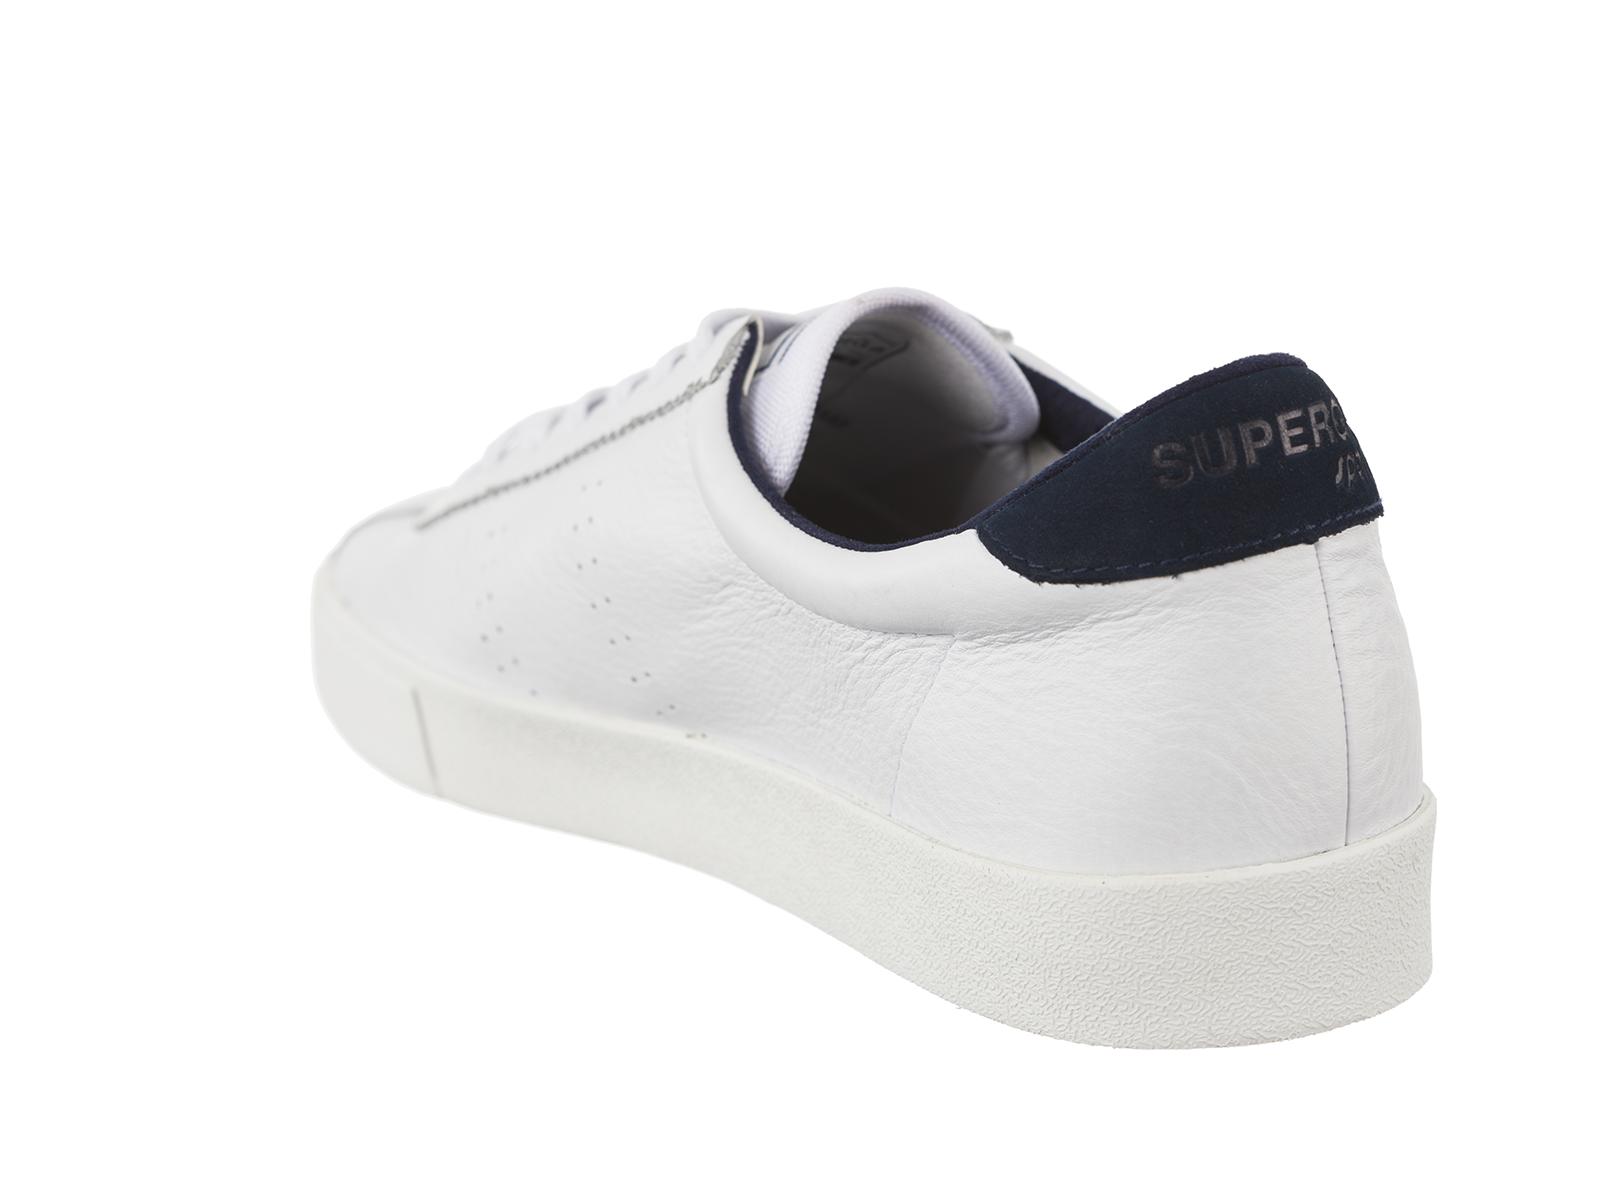 Superga Donna Sneakers Scarpe Da Ginnastica Tessili Stringate Alte Suola Spessa